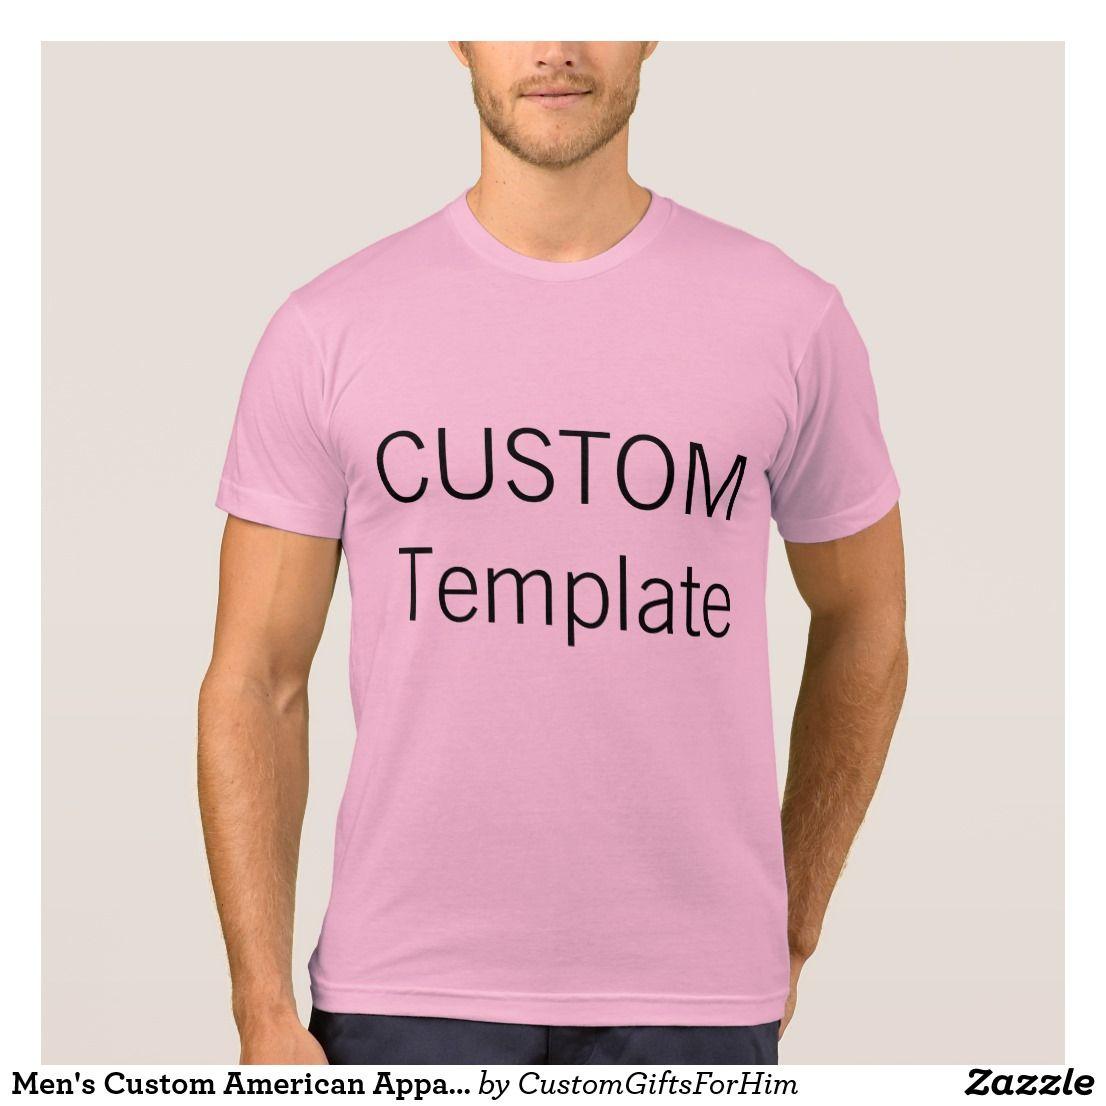 Design your own t shirt american apparel - Men S Custom American Apparel T Shirt Pink